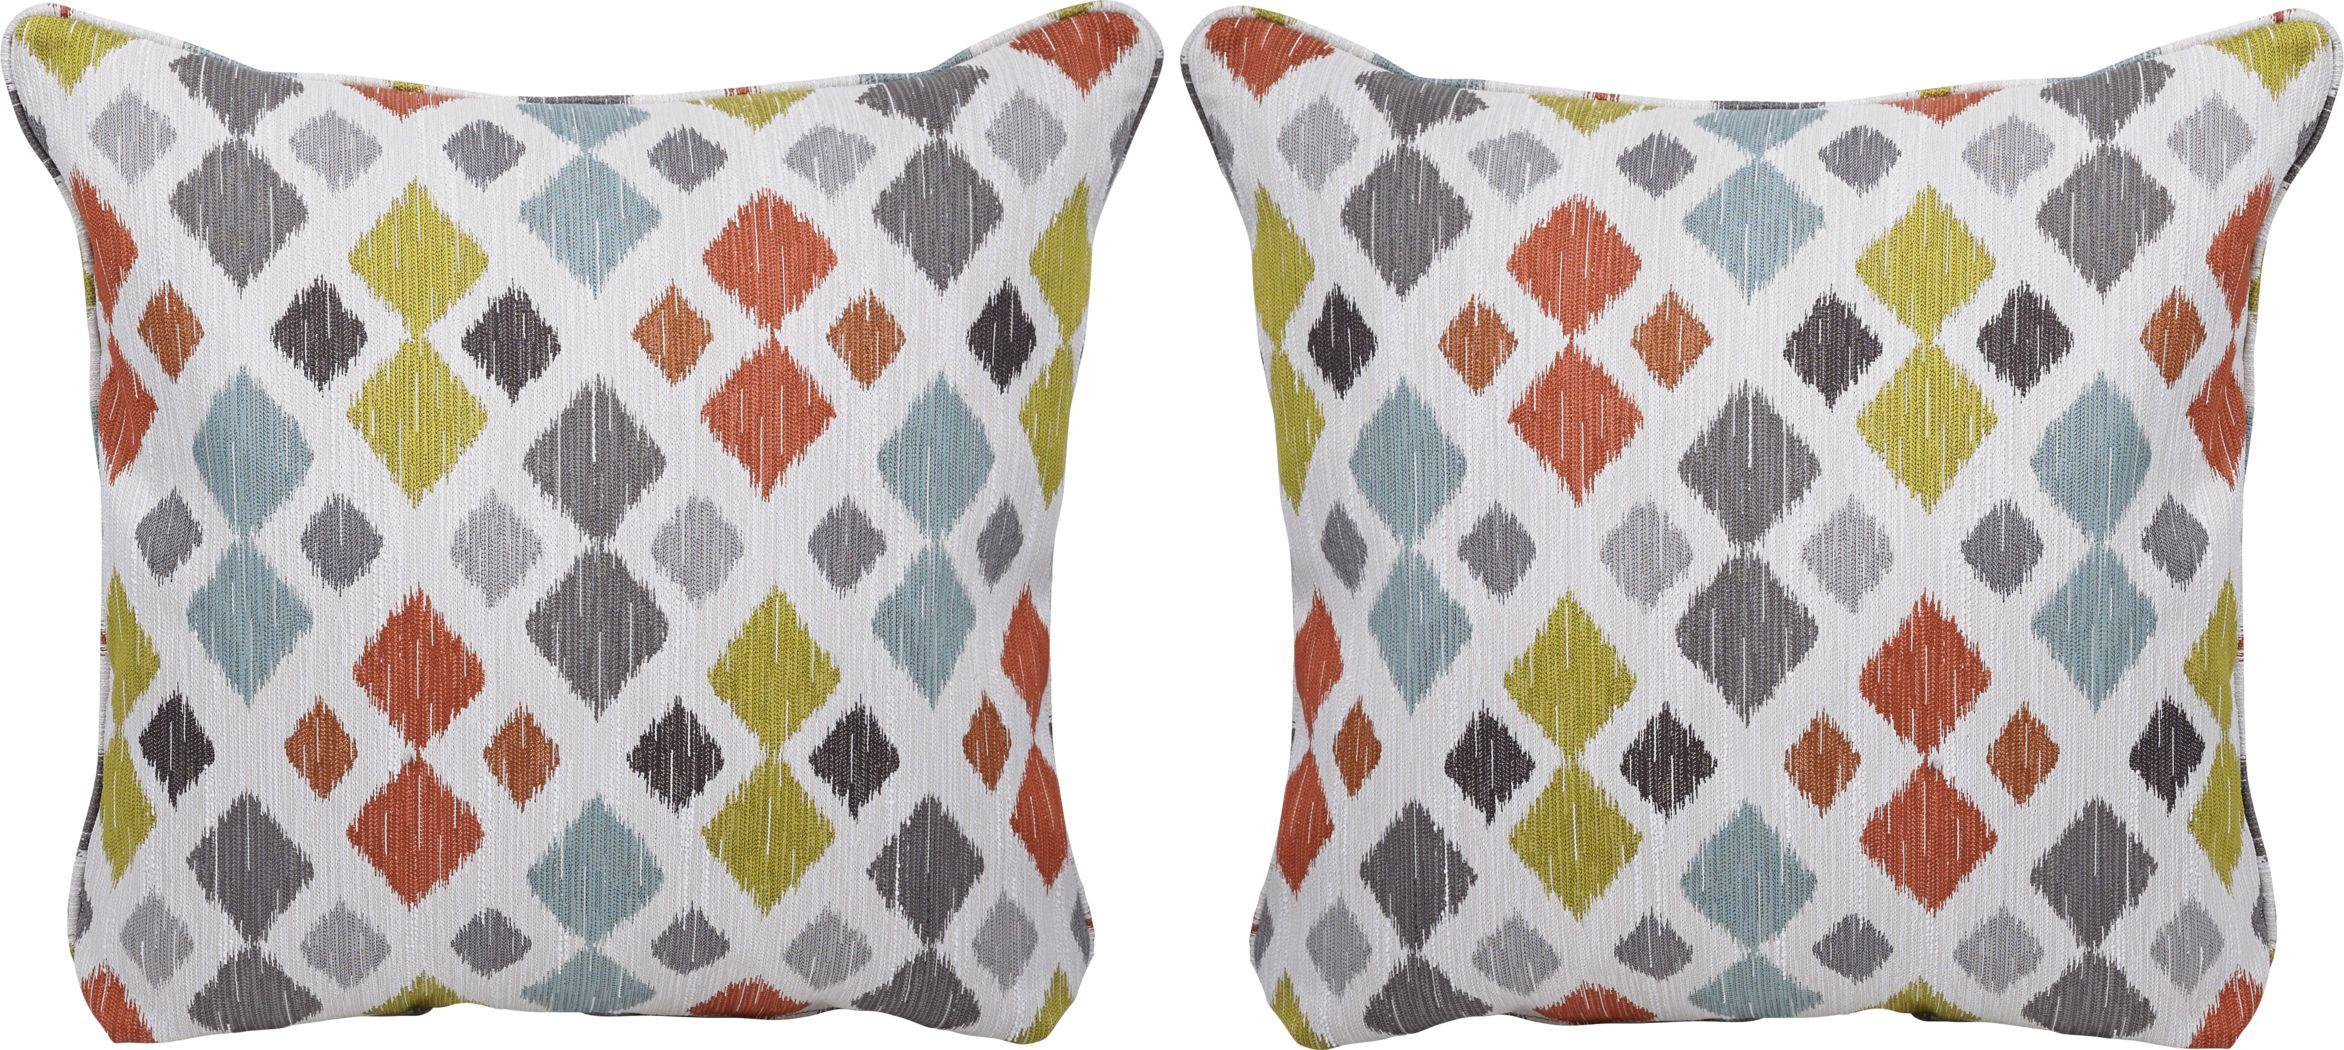 Shibui Tangerine Accent Pillows (Set of 2)